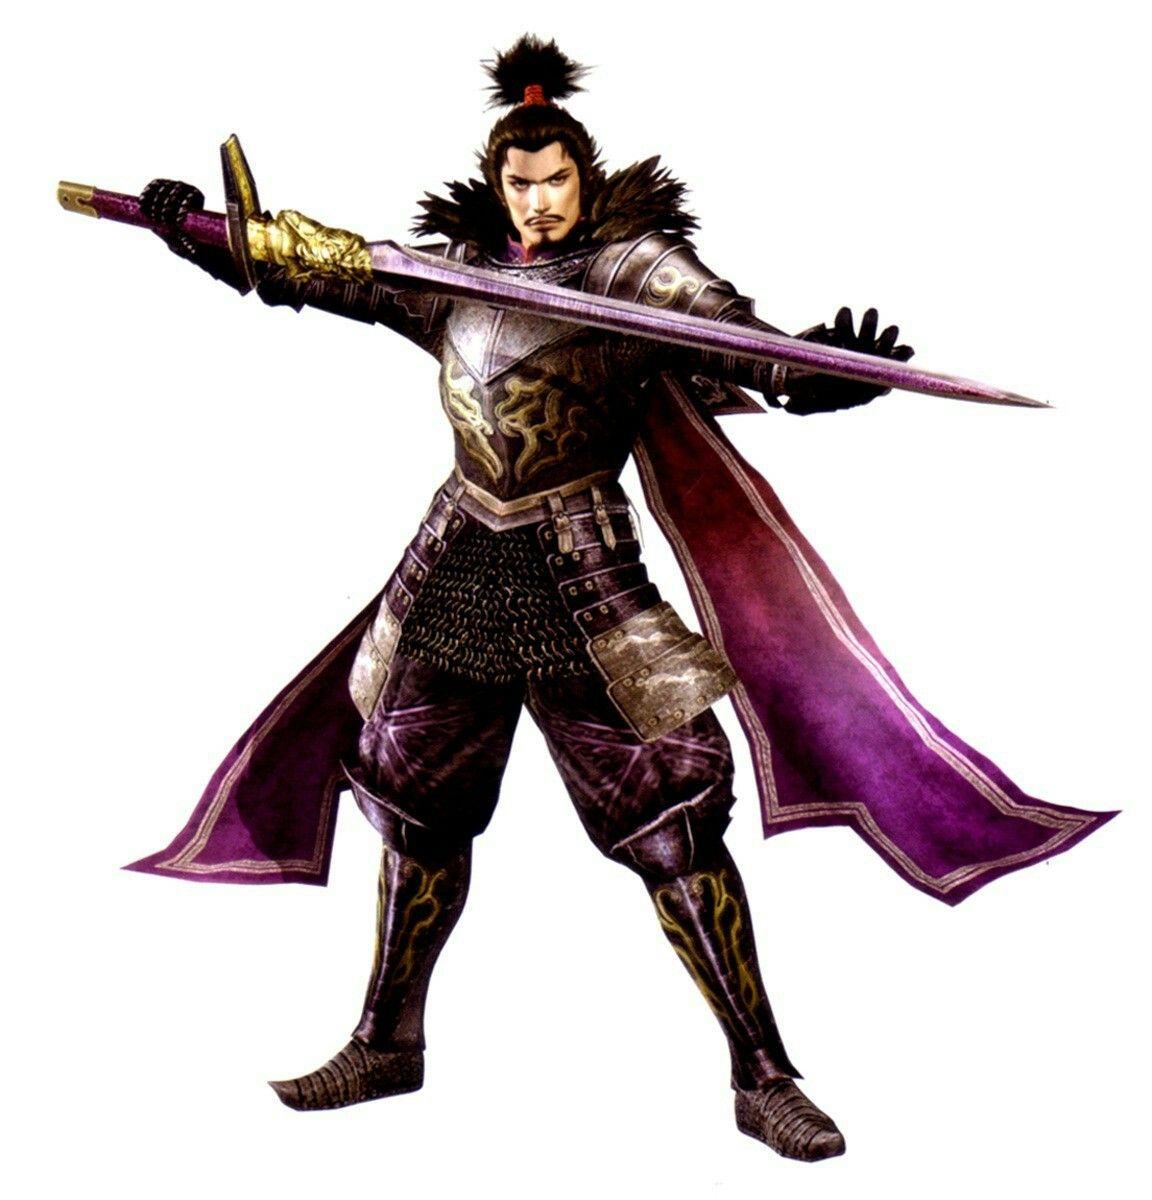 Warriors Orochi 3 Ultimate Nobunaga Oda: Nobunaga Oda -Samurai Warriors